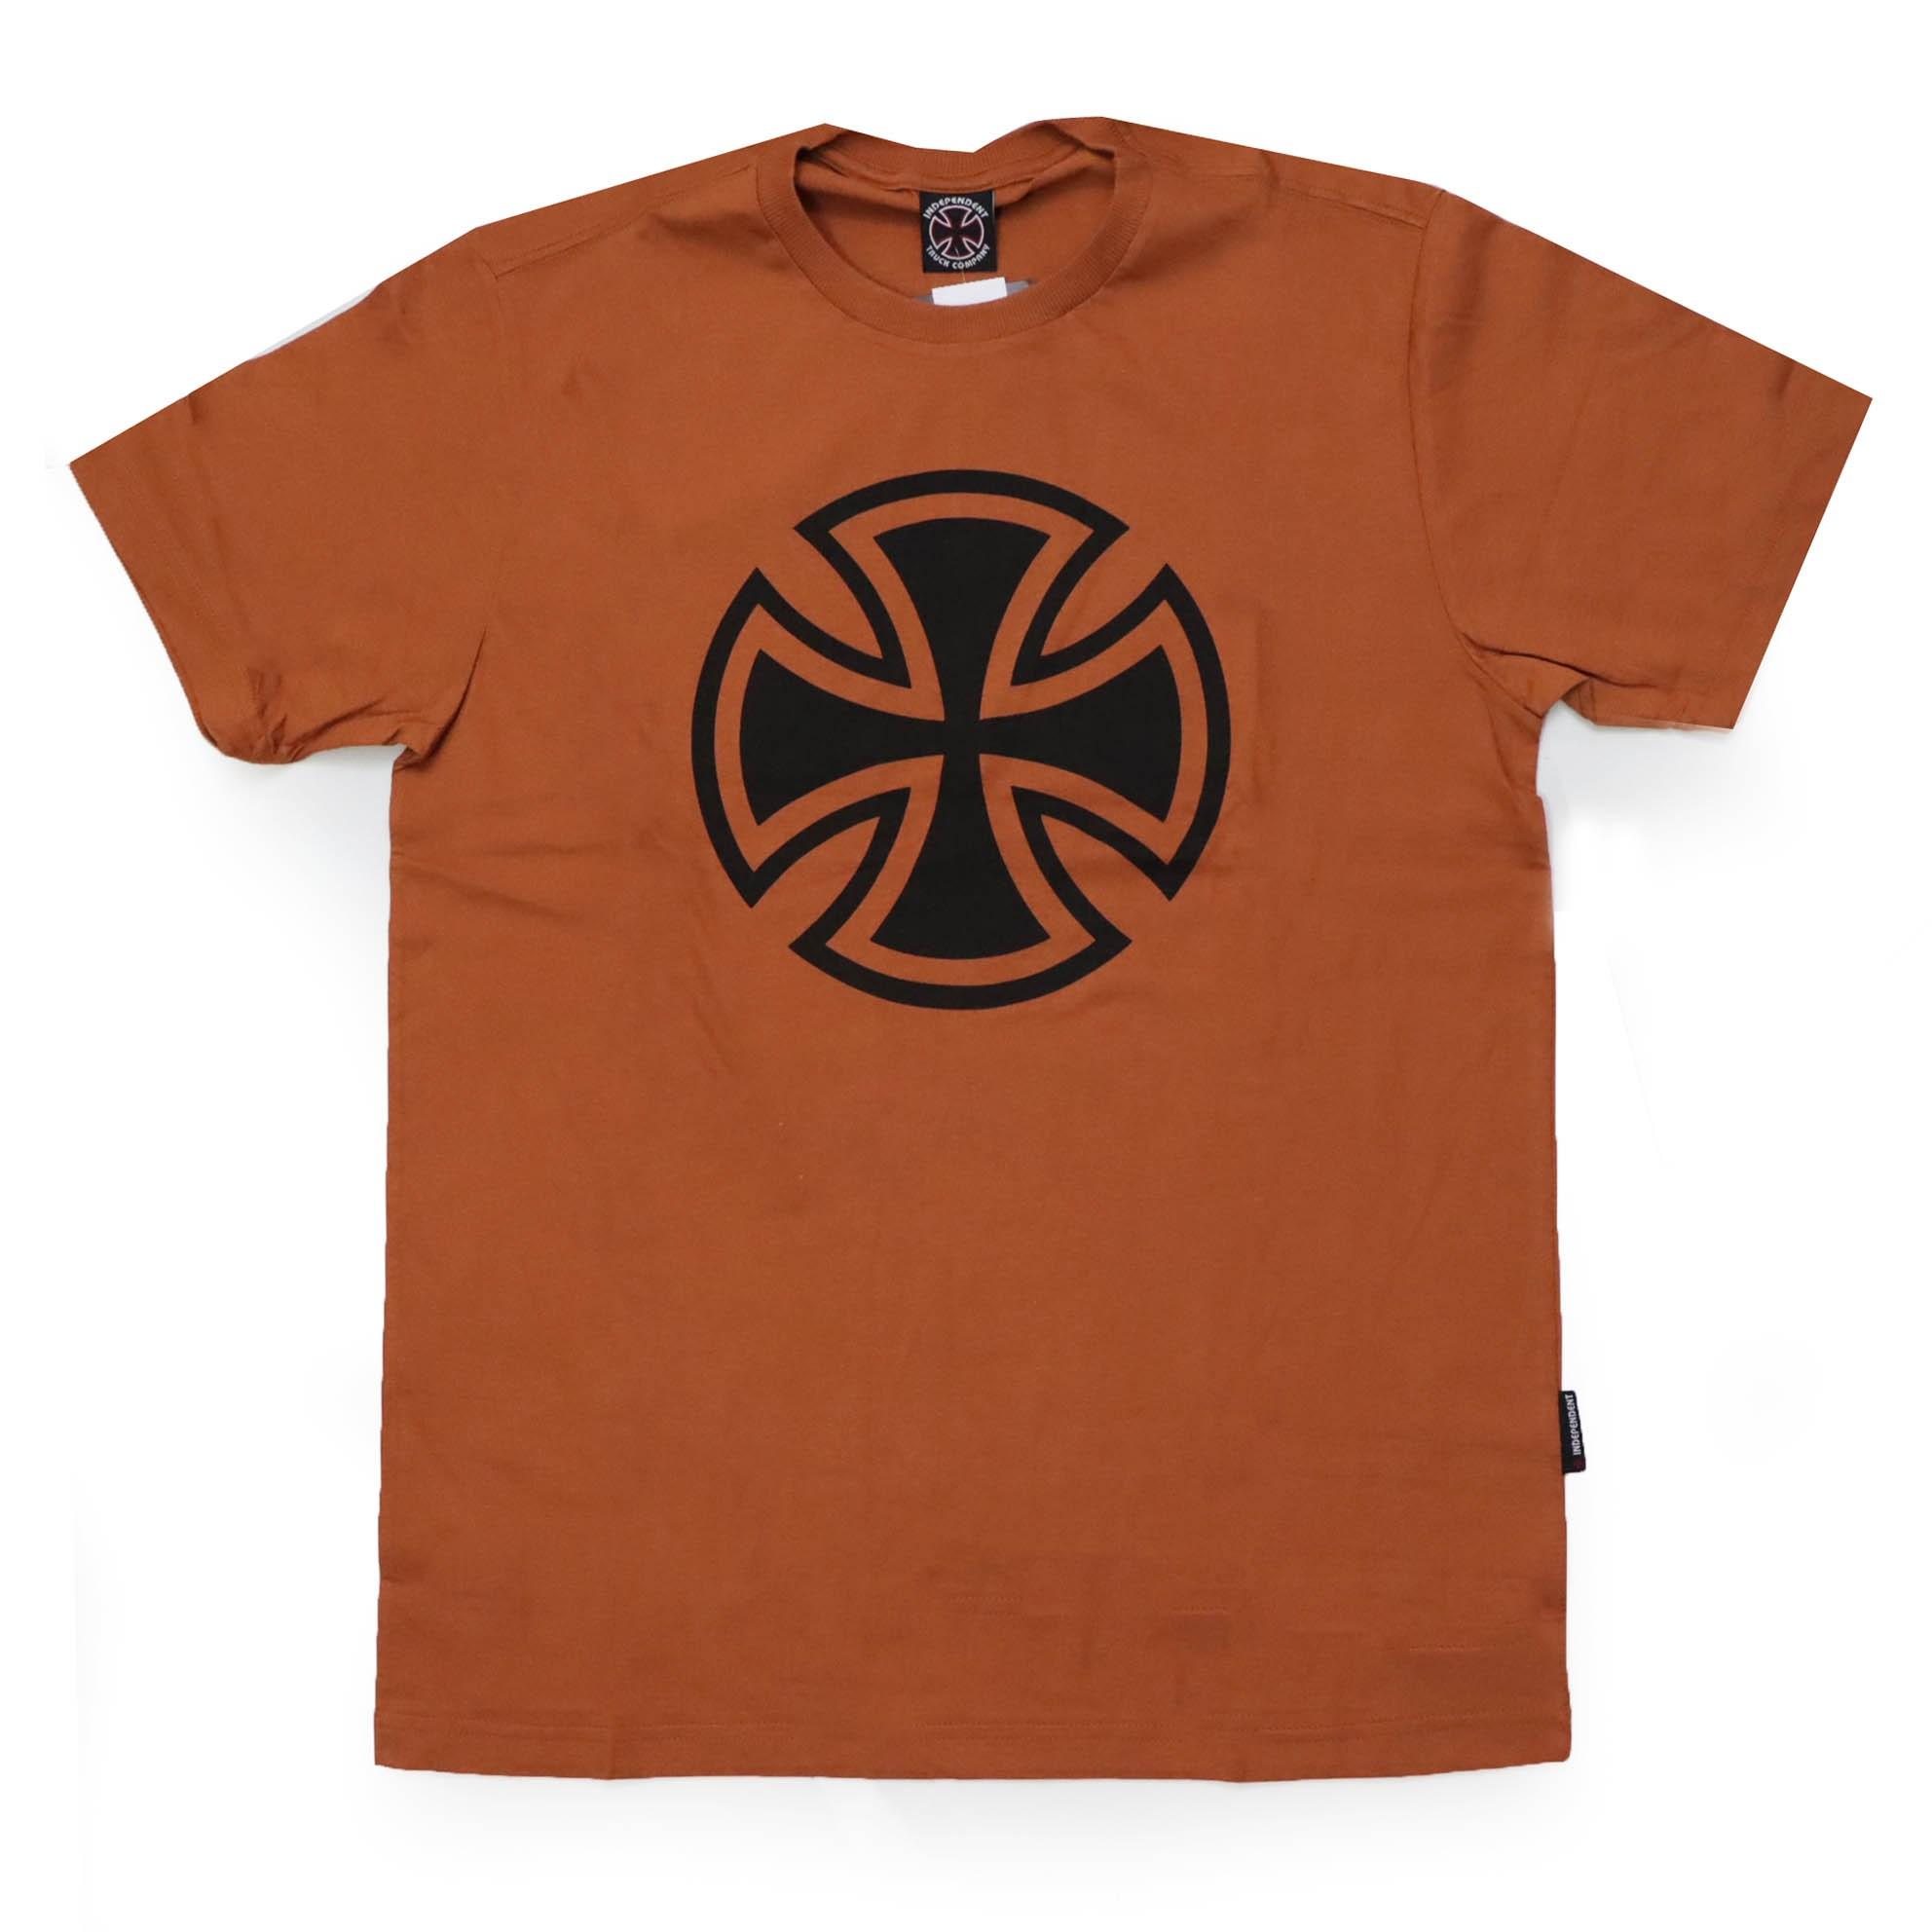 Camiseta Independent 3 Tier Cross 1 Color - Cobre